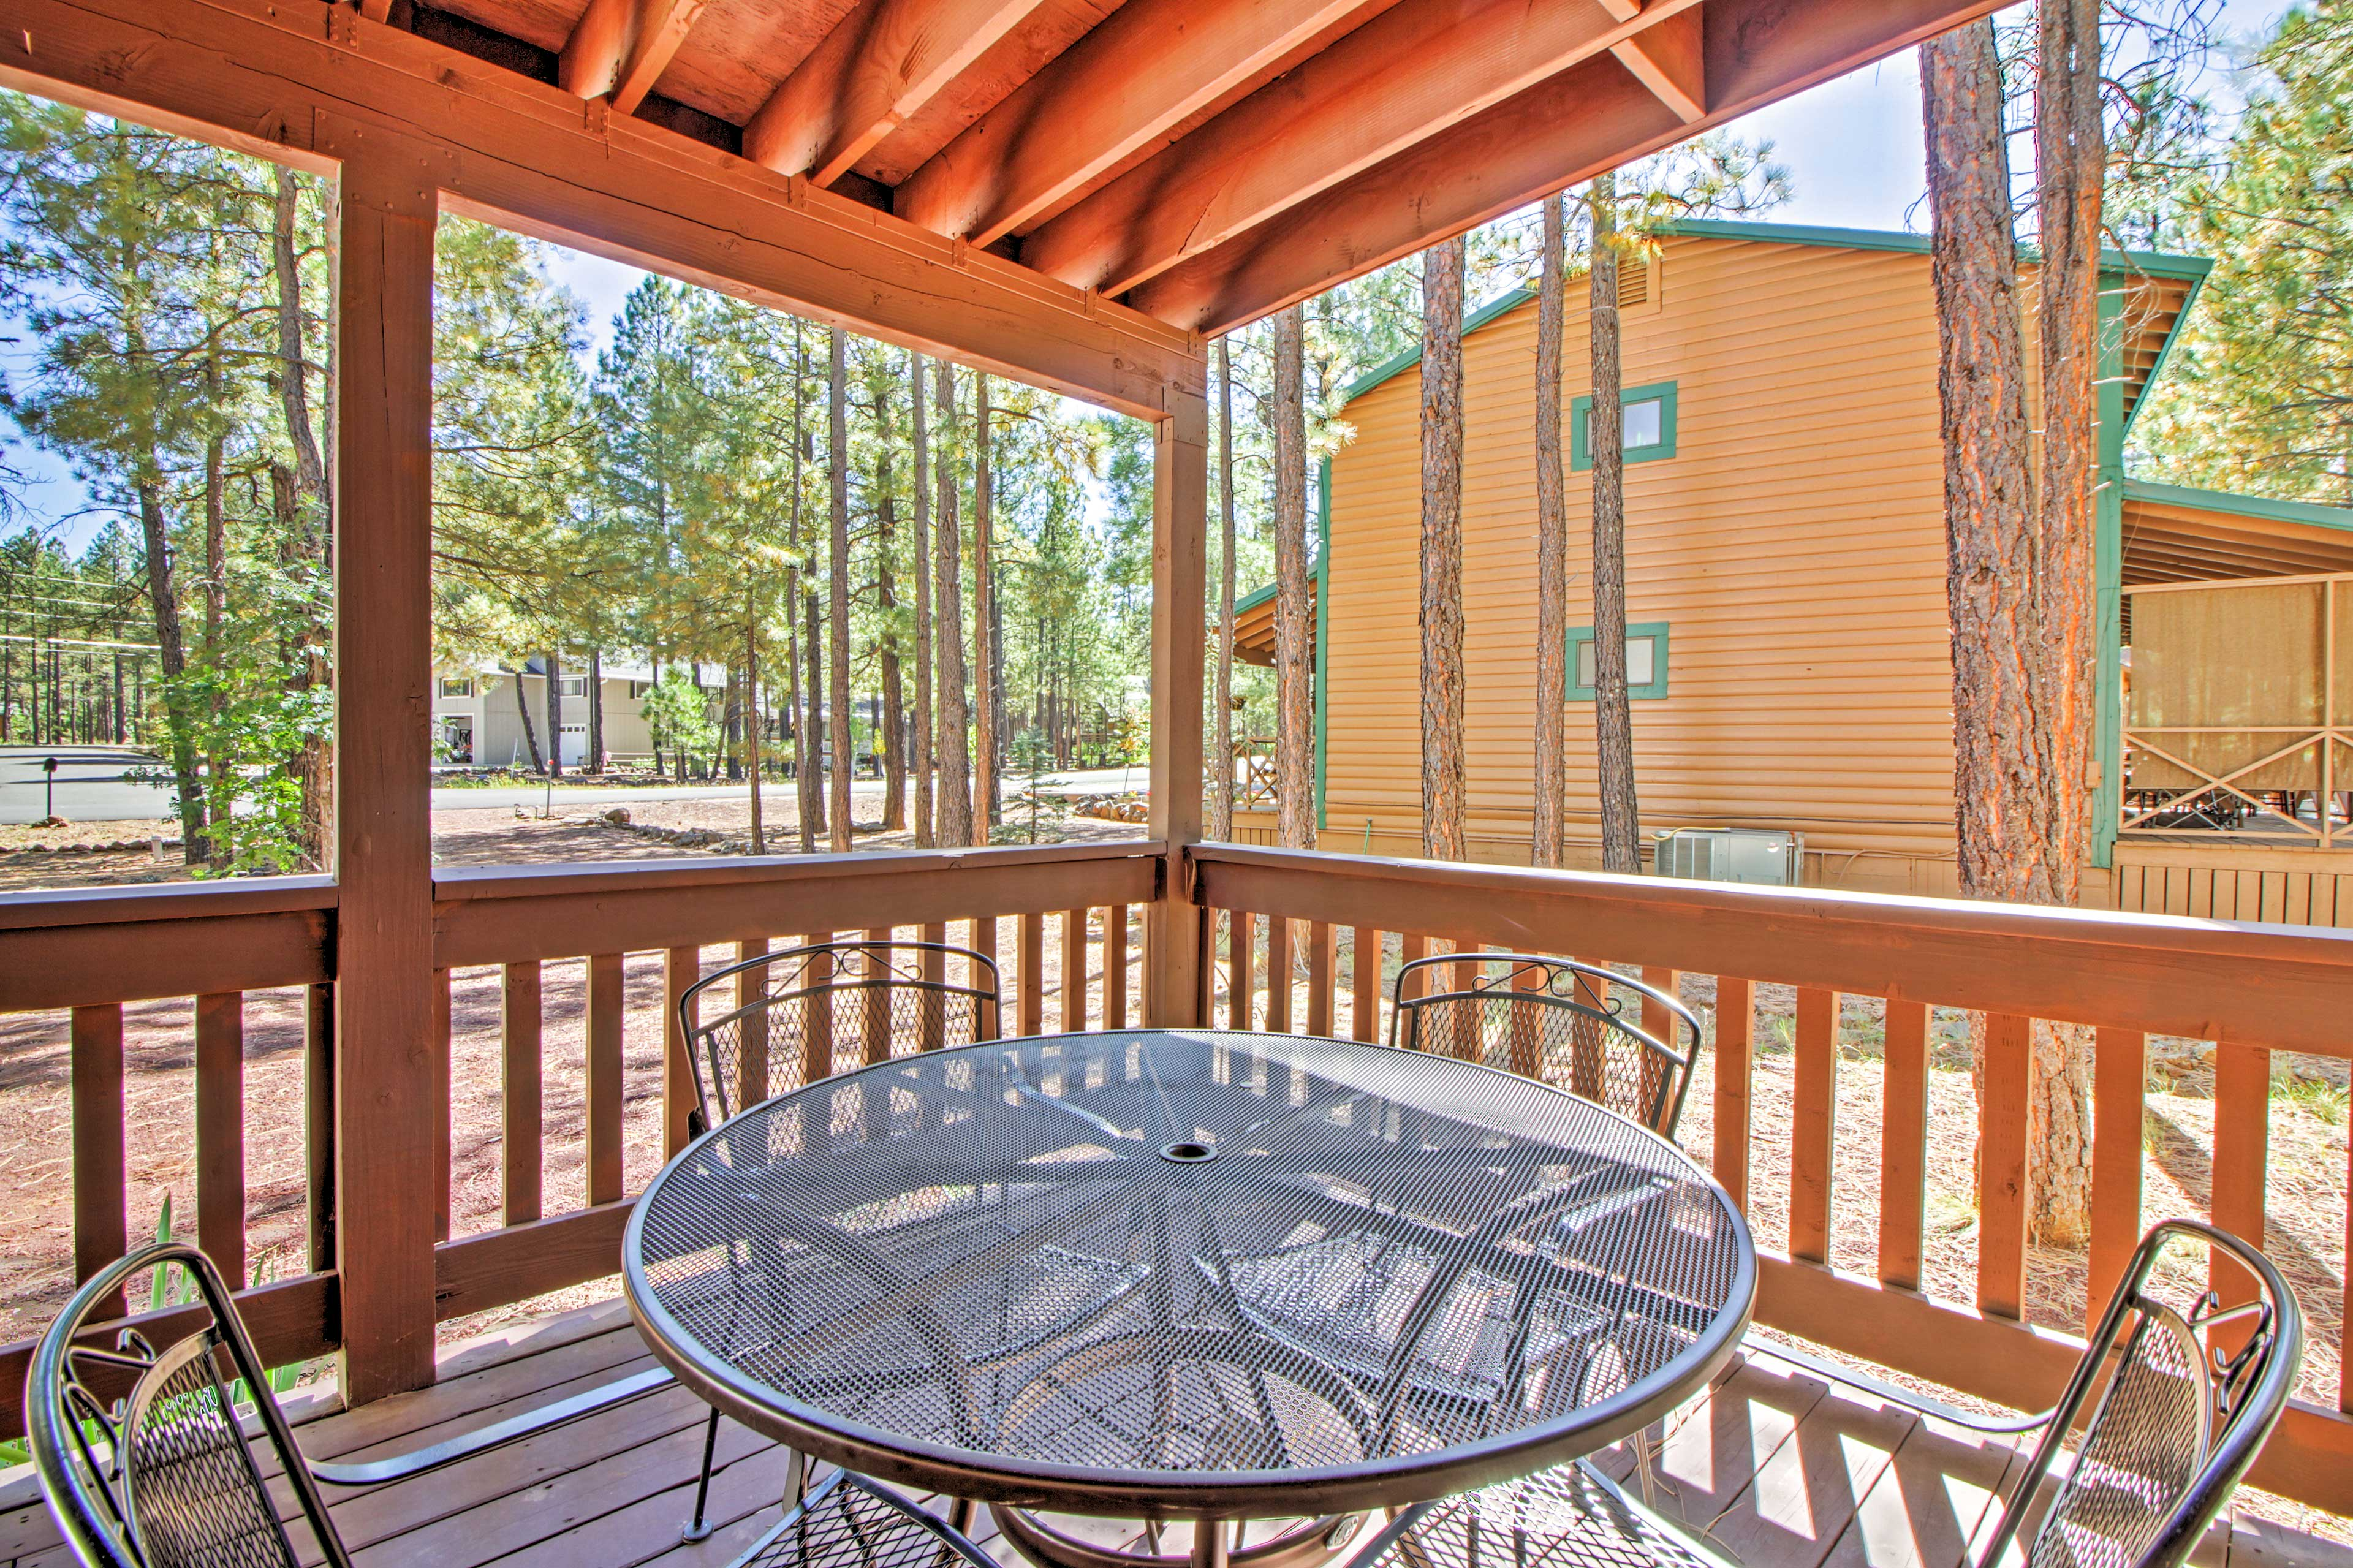 Pinetop adventures and amenities await!